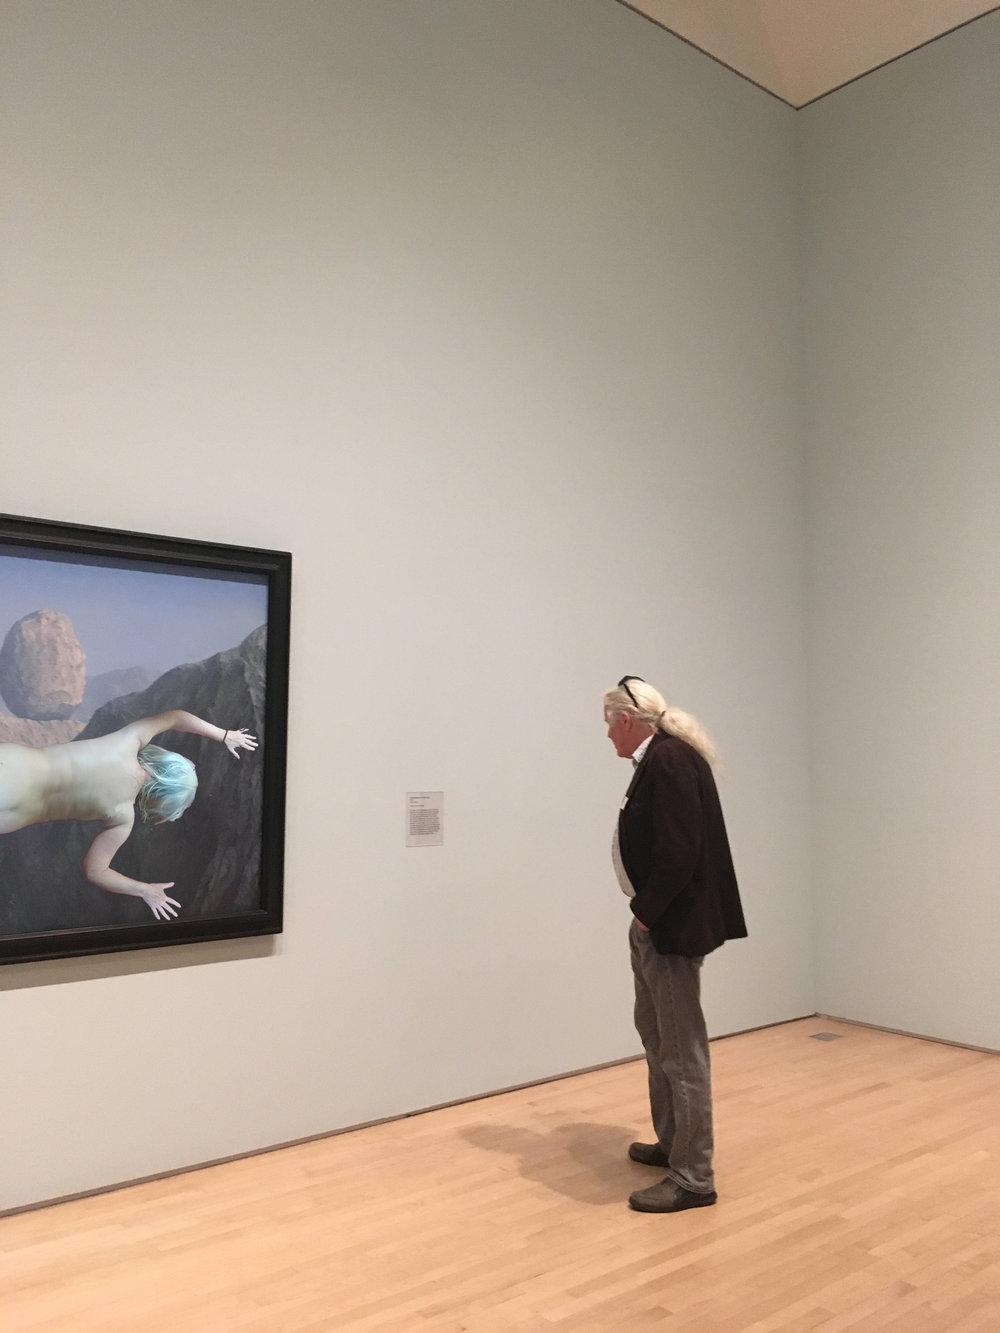 magritte-room-hol.jpg